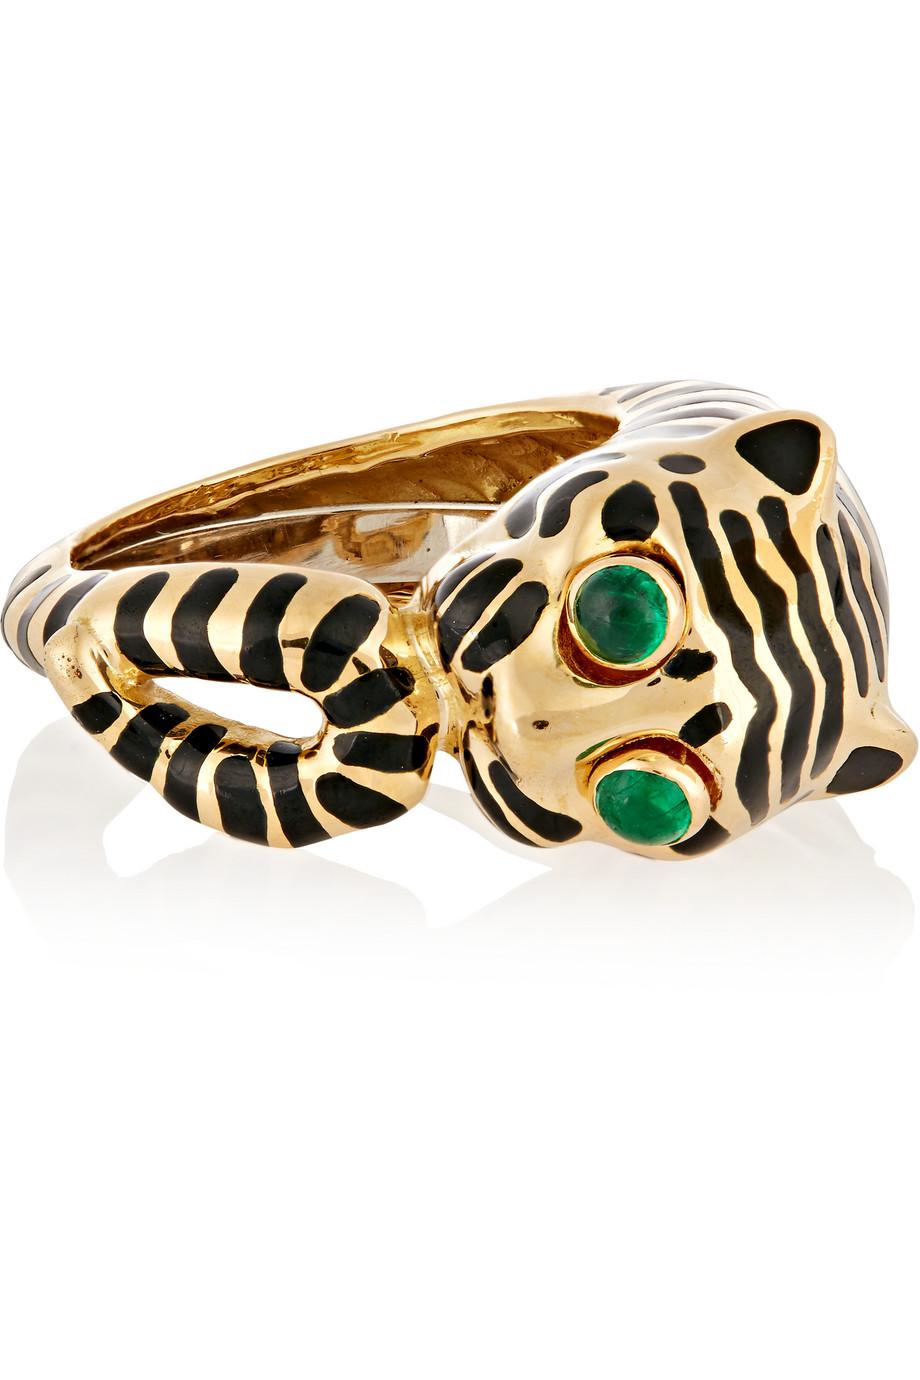 David Webb Tiger 18-Karat Gold, Emerald and Enamel Ring, Gold/Green, Women's, Size: 6 1/2